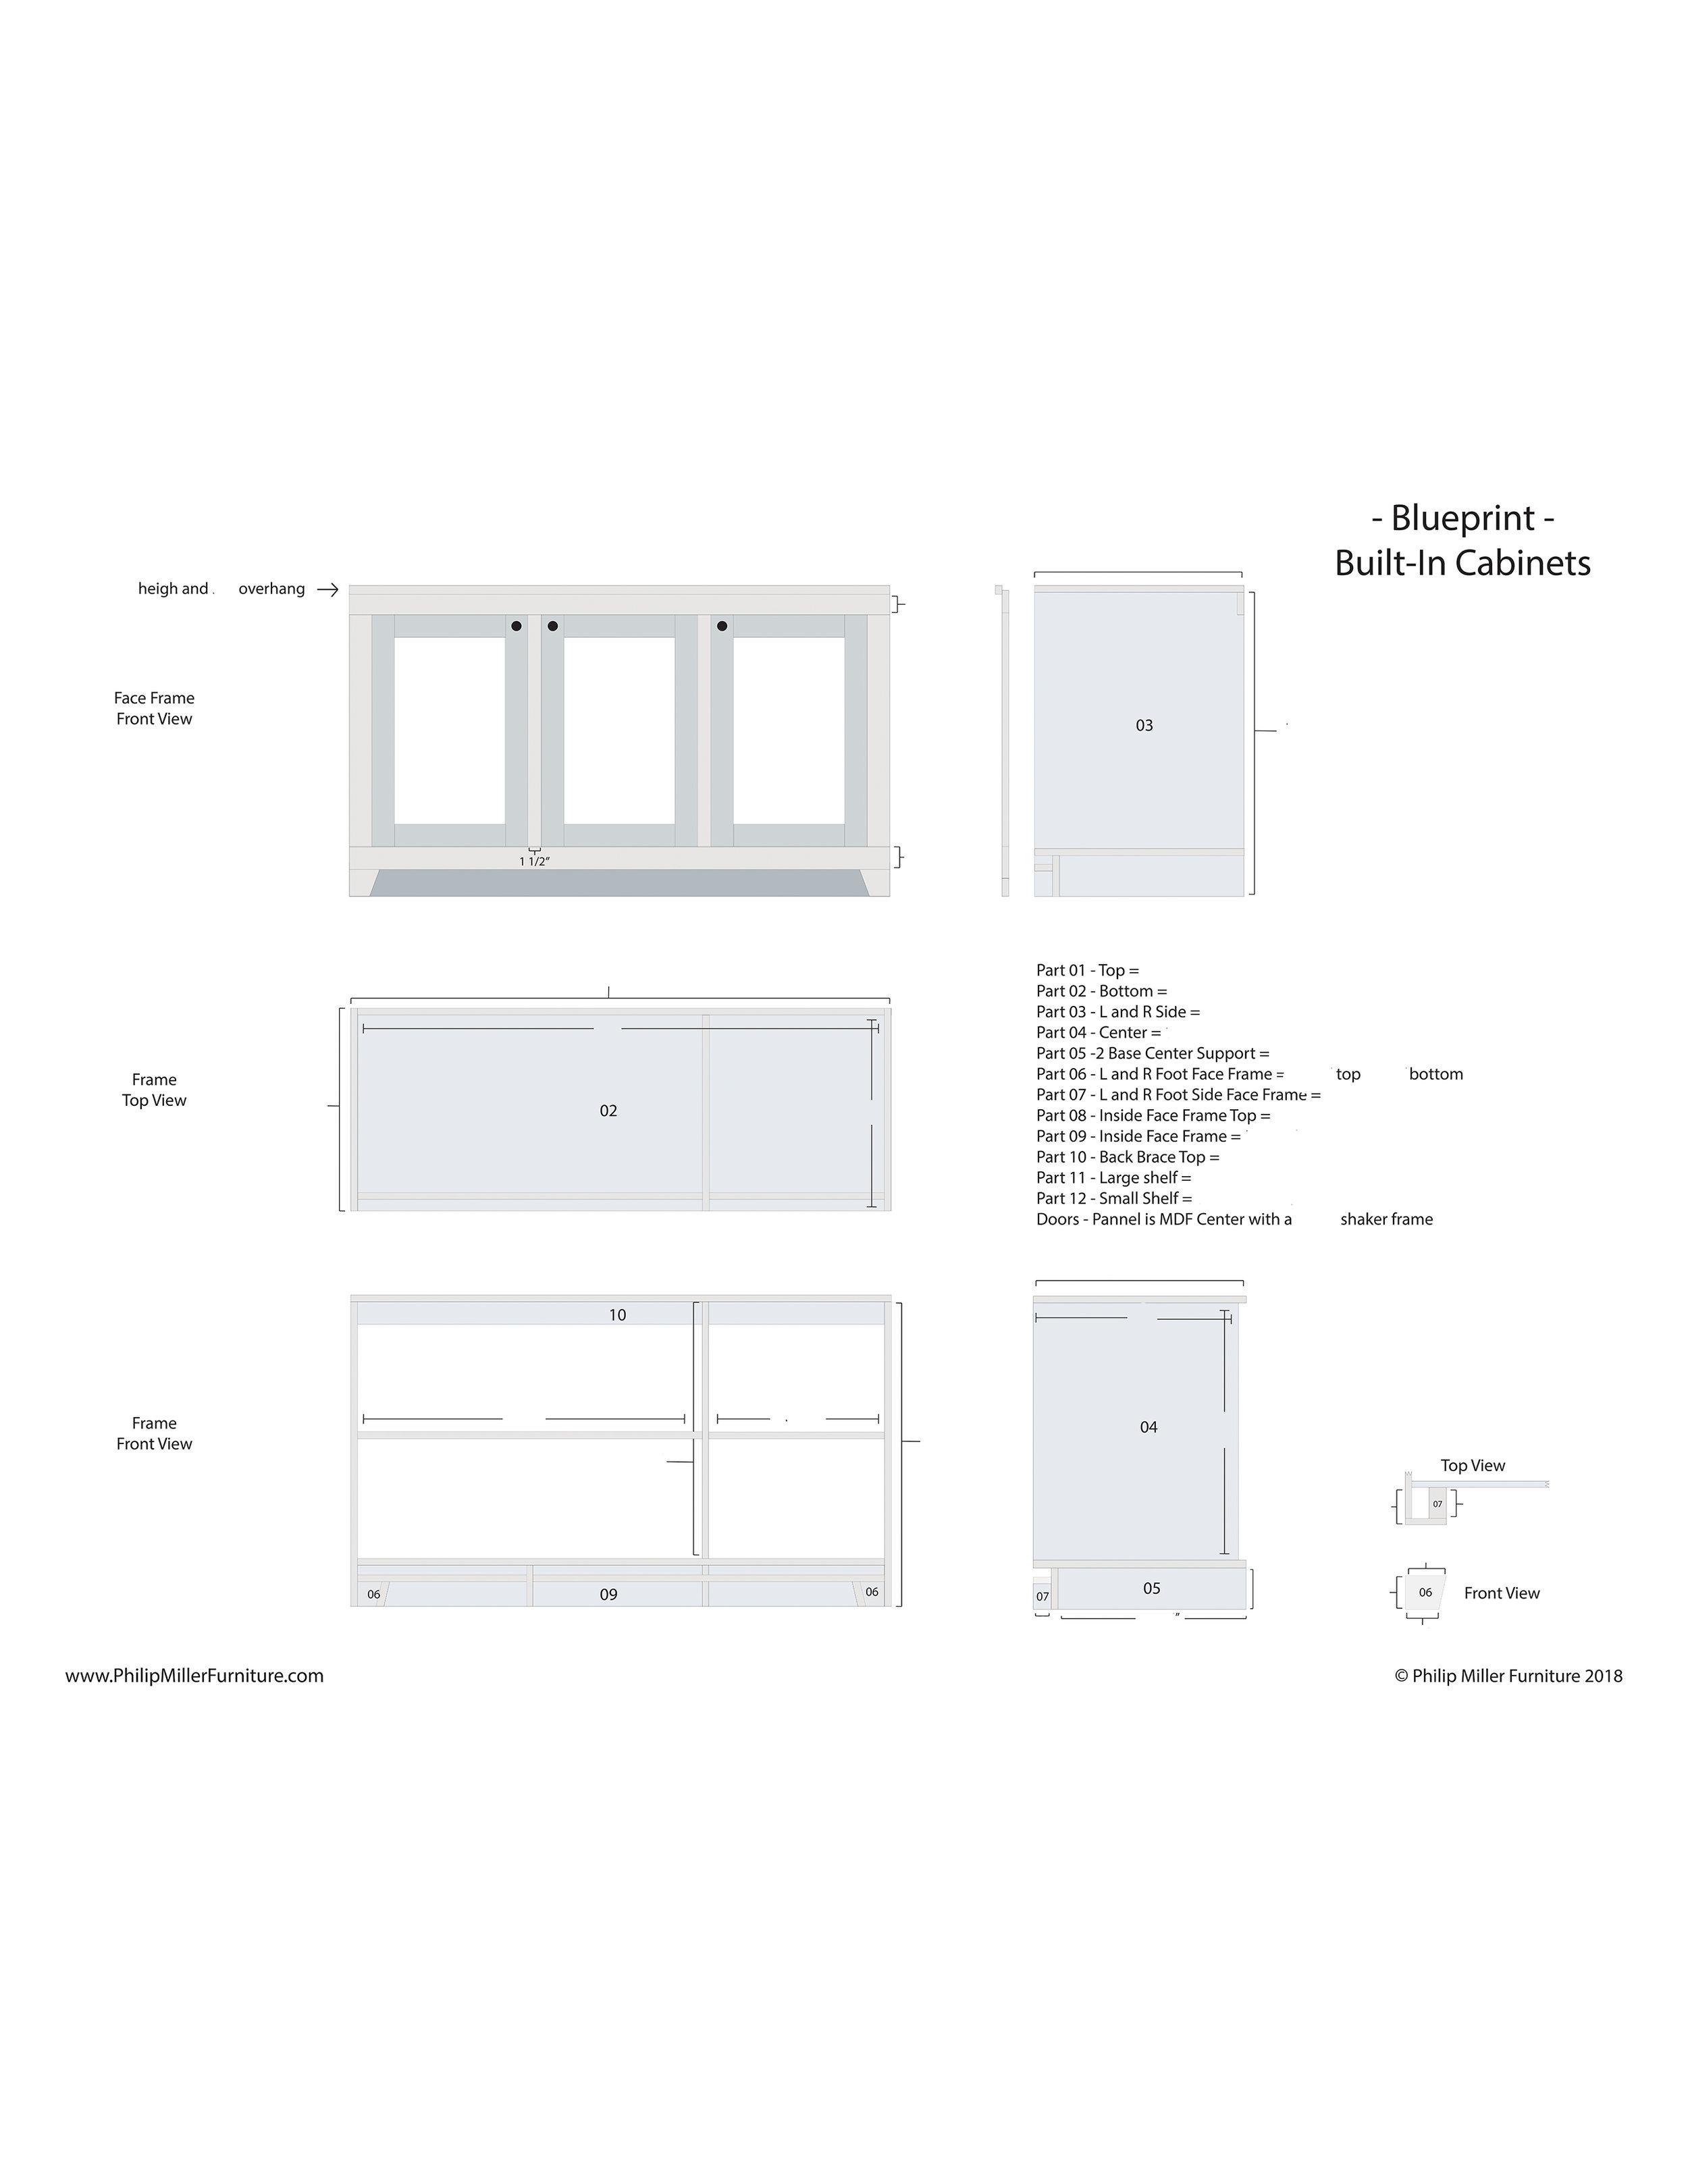 Builting_Cabinets.jpg